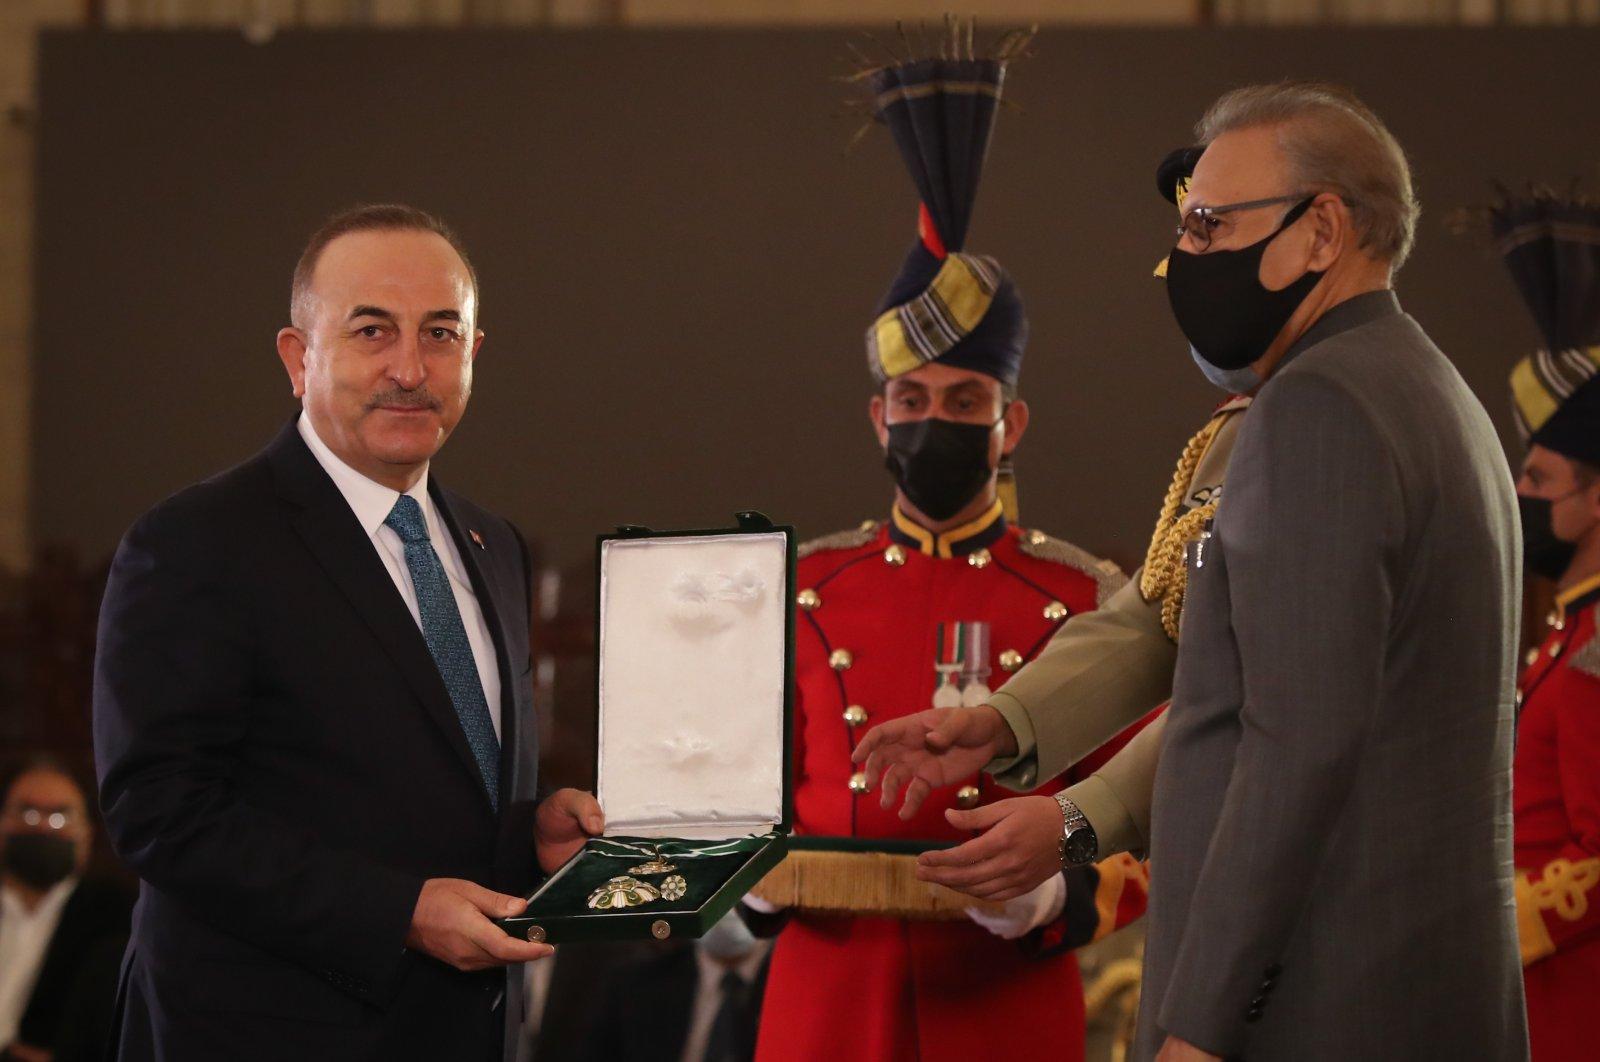 Foreign Minister Mevlüt Çavuşoğlu receives the Hilal-e Pakistan Award in Islamabad, Pakistan, Jan.13, 2021. (AA)